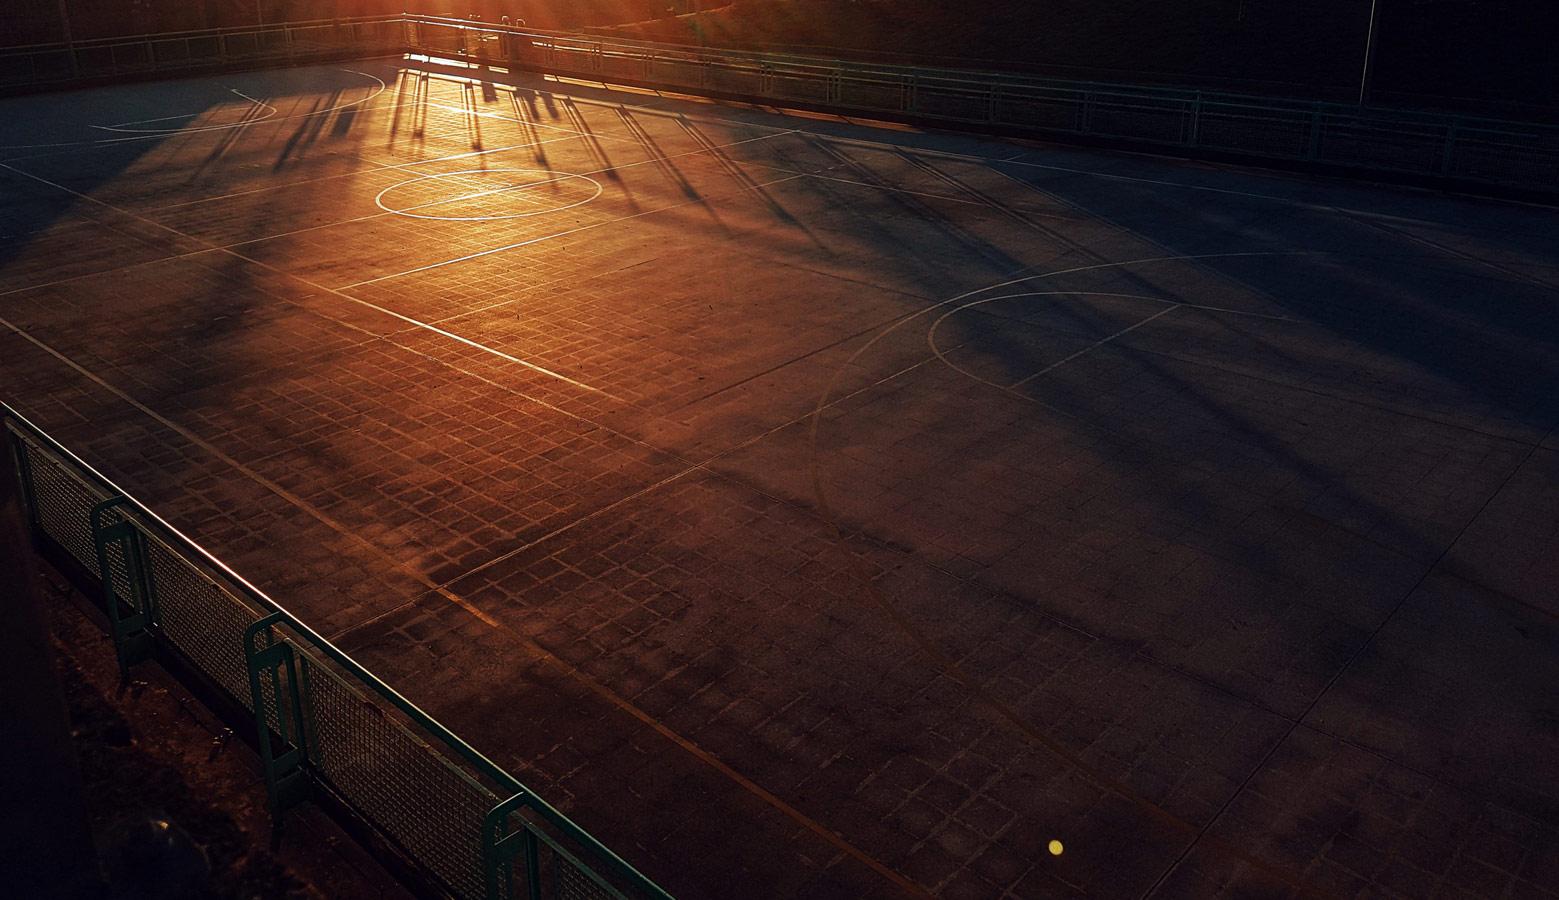 © Беноччи Федерико, Фотоконкурс Международной федерации баскетбола — FIBA Photo Contest